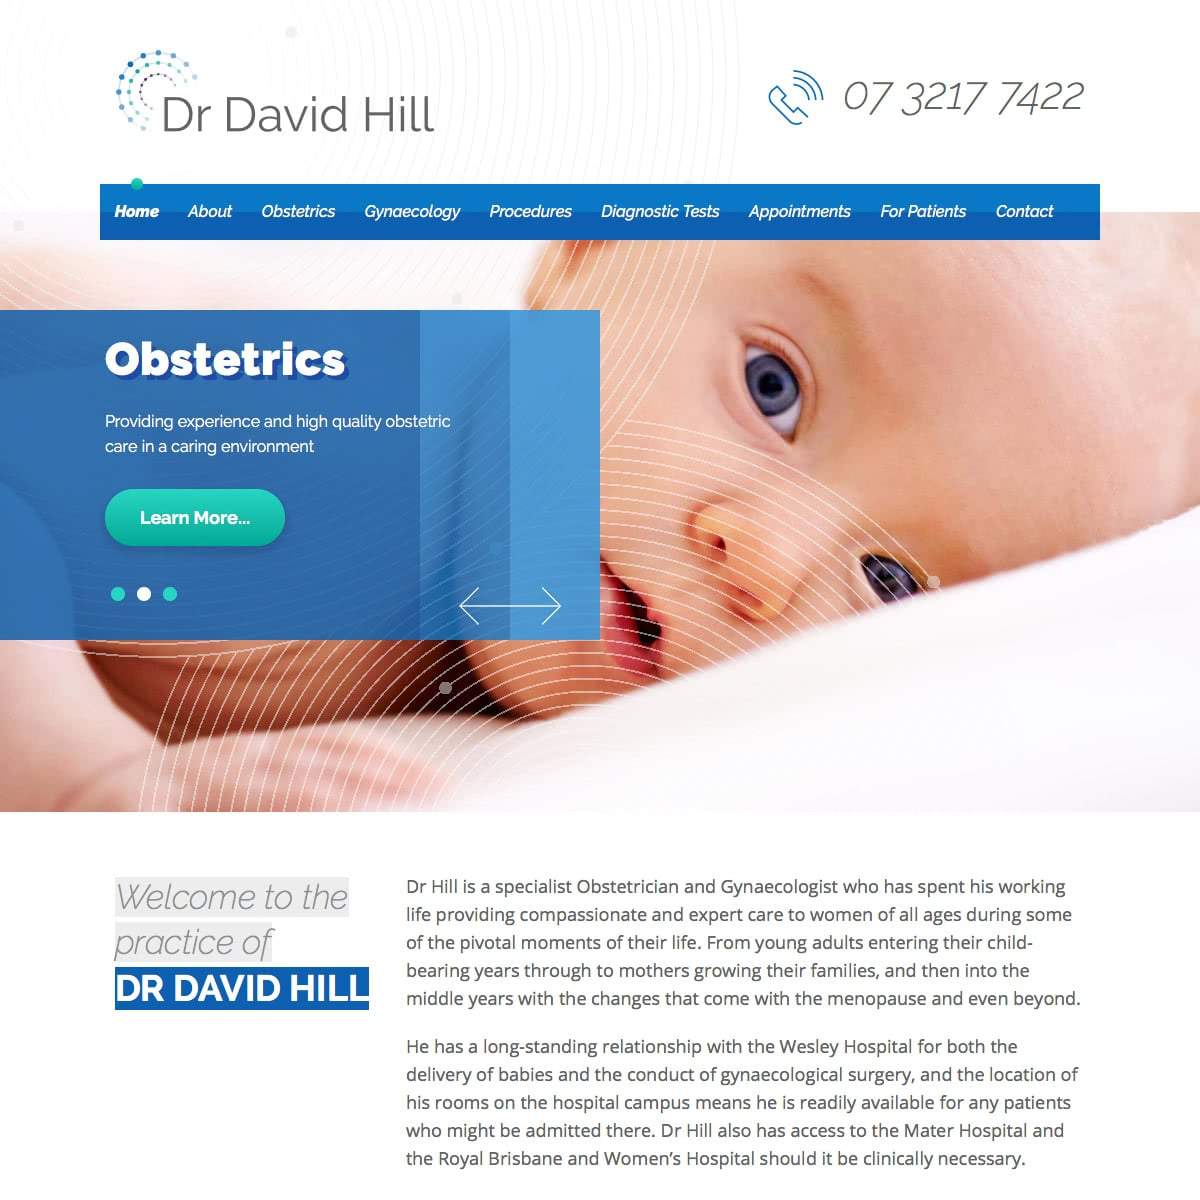 Dr David Hill - Home